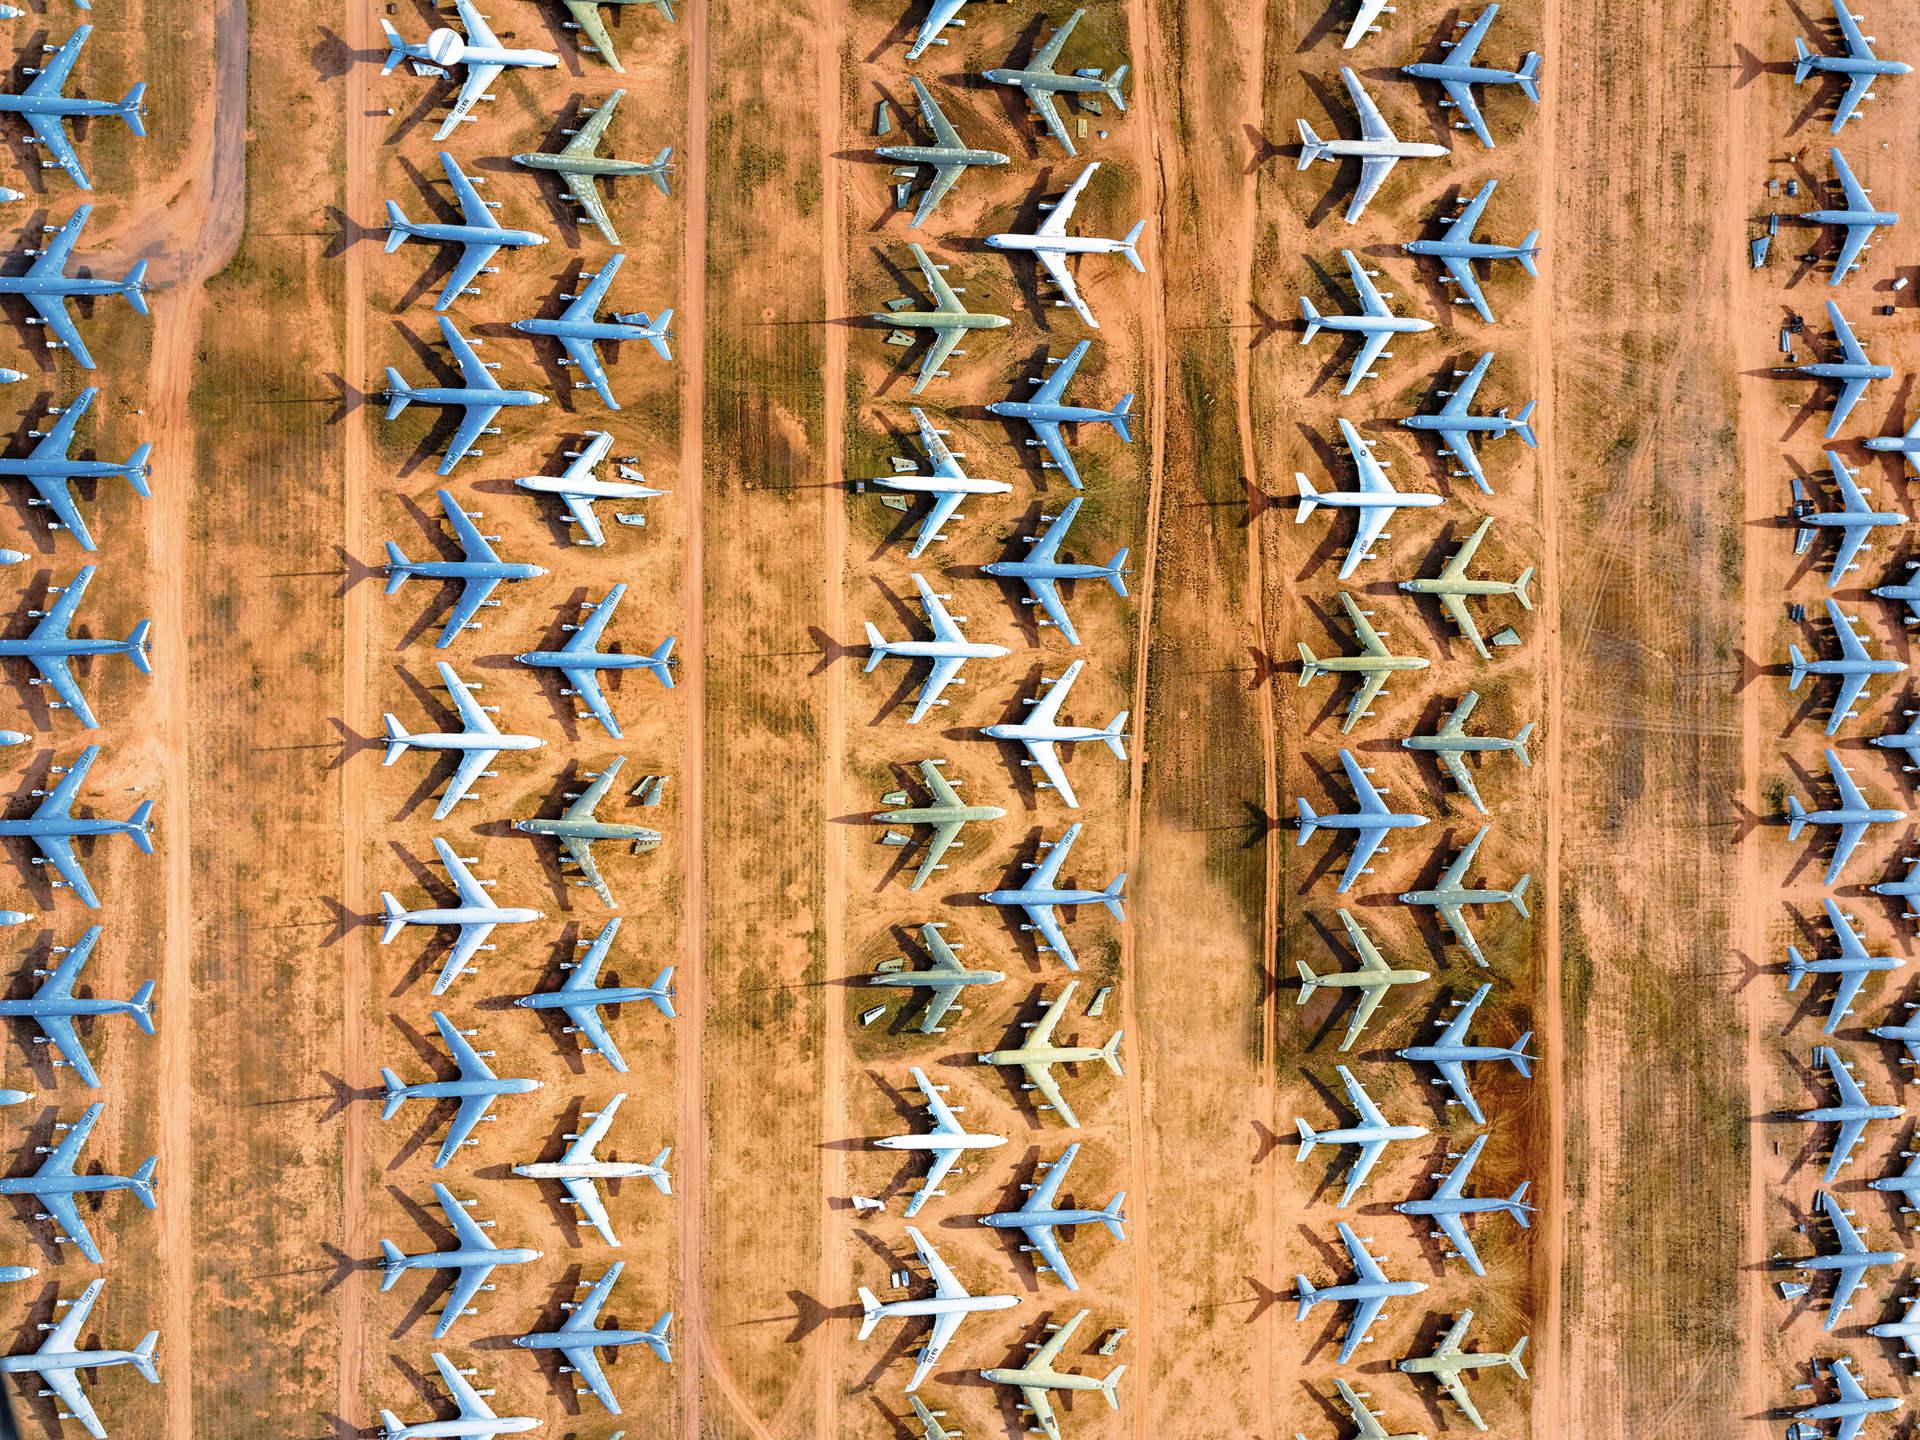 'Supersonic' - Tuscon, Arizona